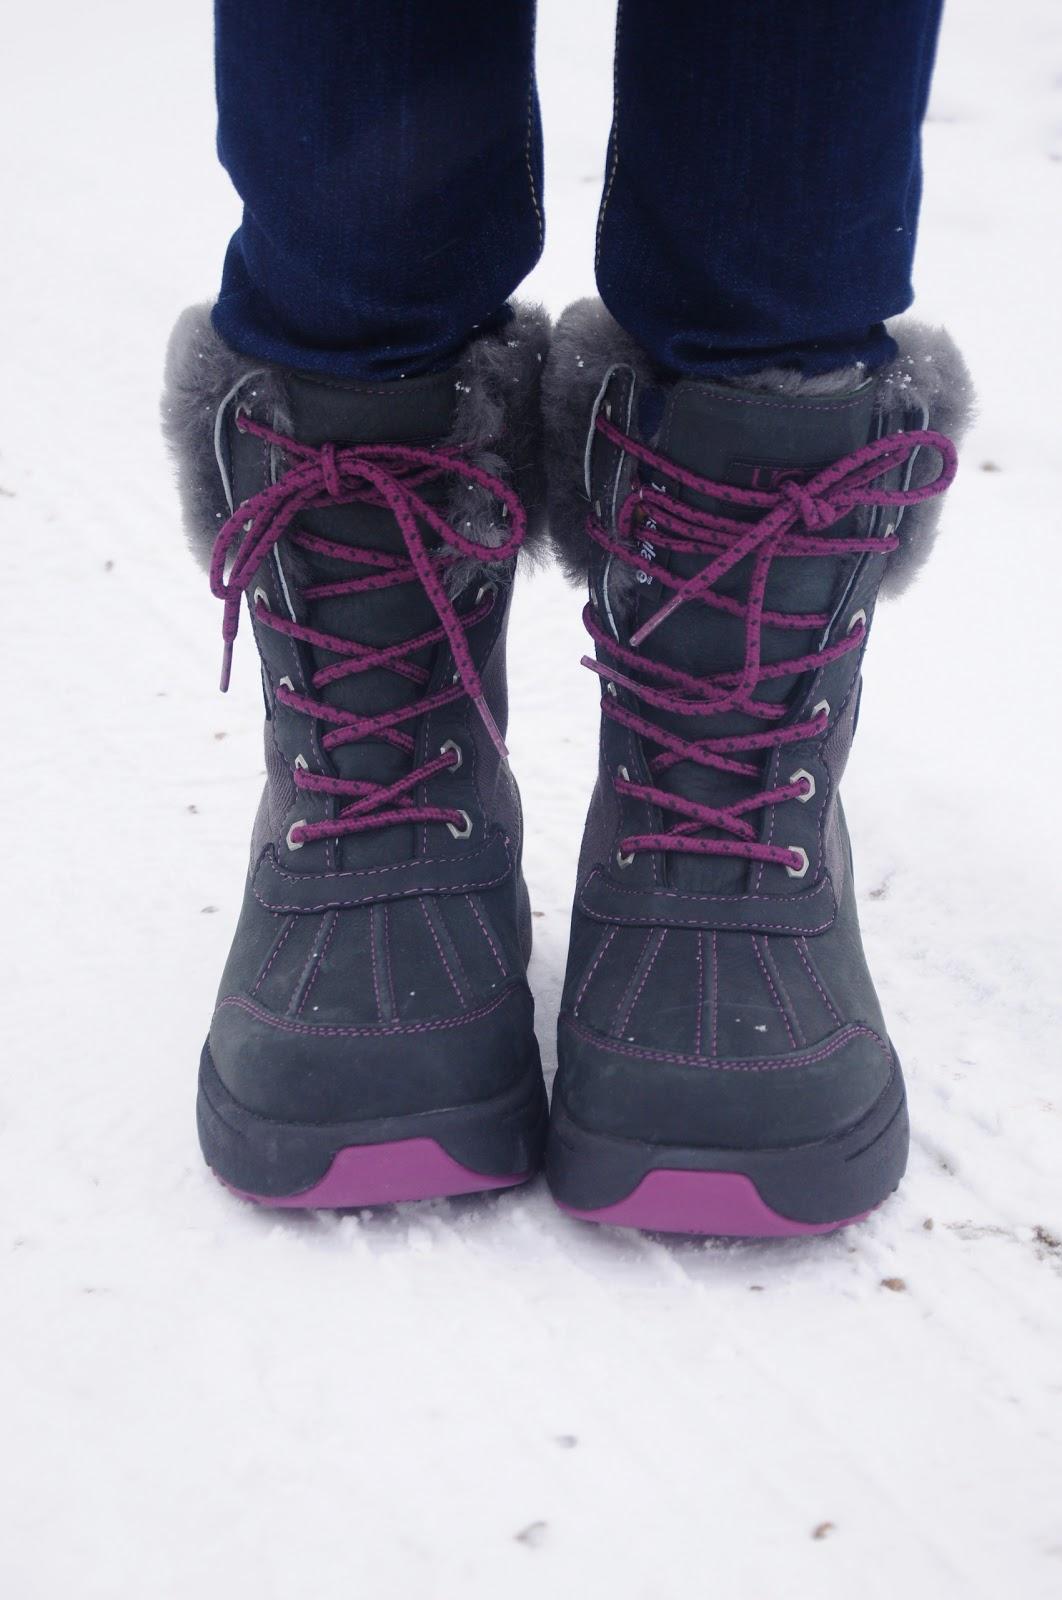 UGG with Hoka technology winter boot